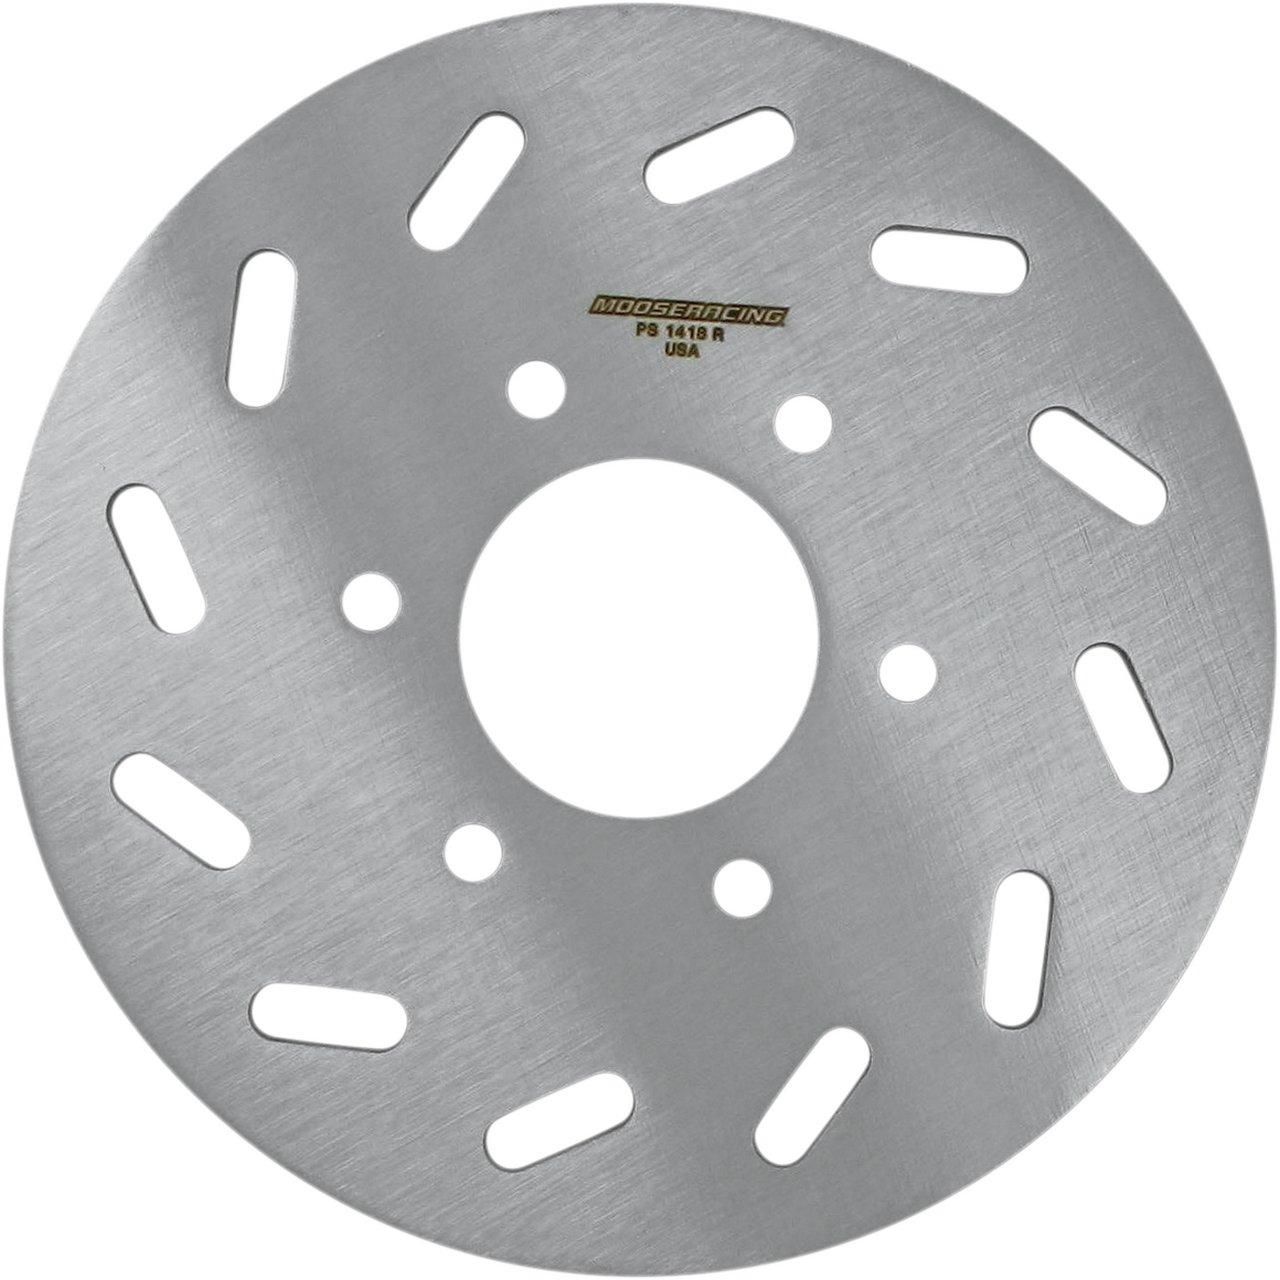 【MOOSE RACING】維修用煞車碟盤 [1711-0446] - 「Webike-摩托百貨」